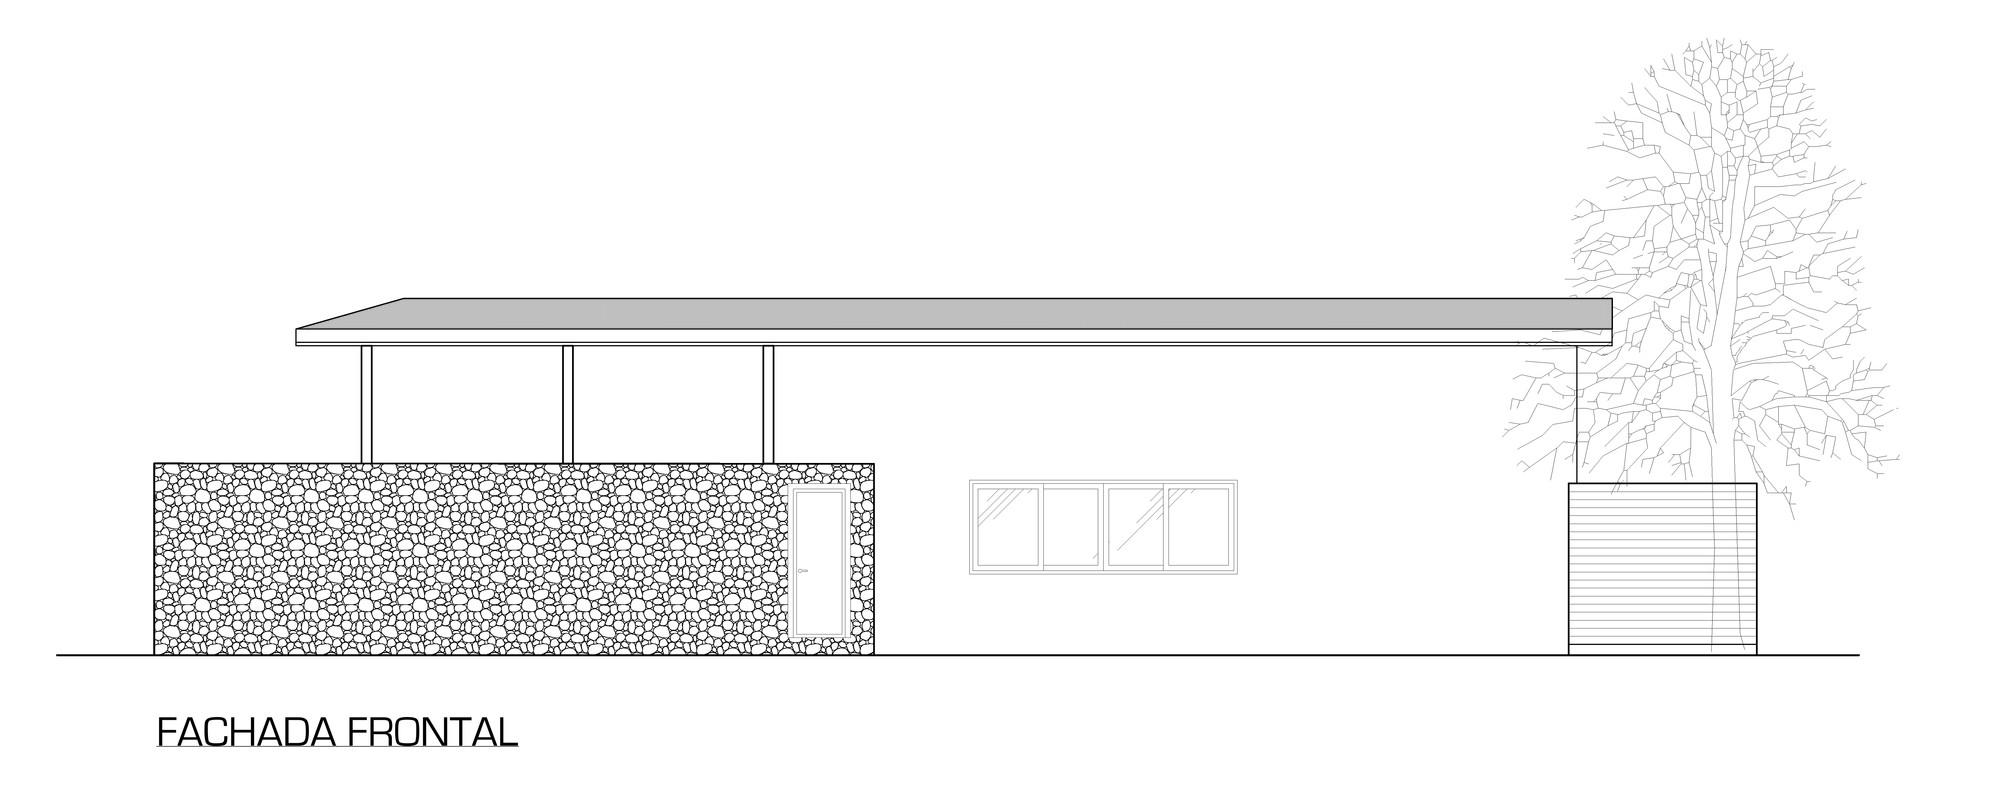 Galer a de casa jard n del mar salagnac arquitectos 14 for Casas jardin del mar